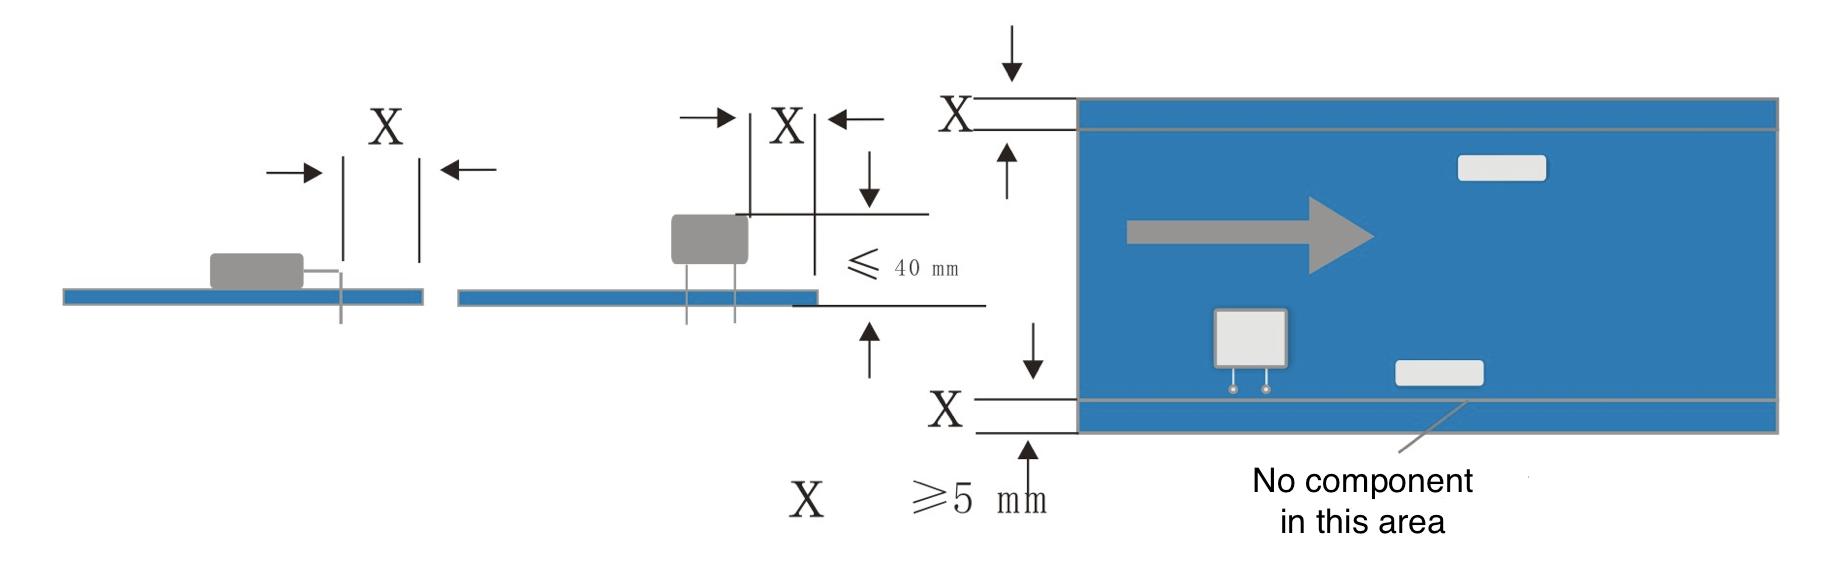 Schematic Diagram of PCB Transfer Edge